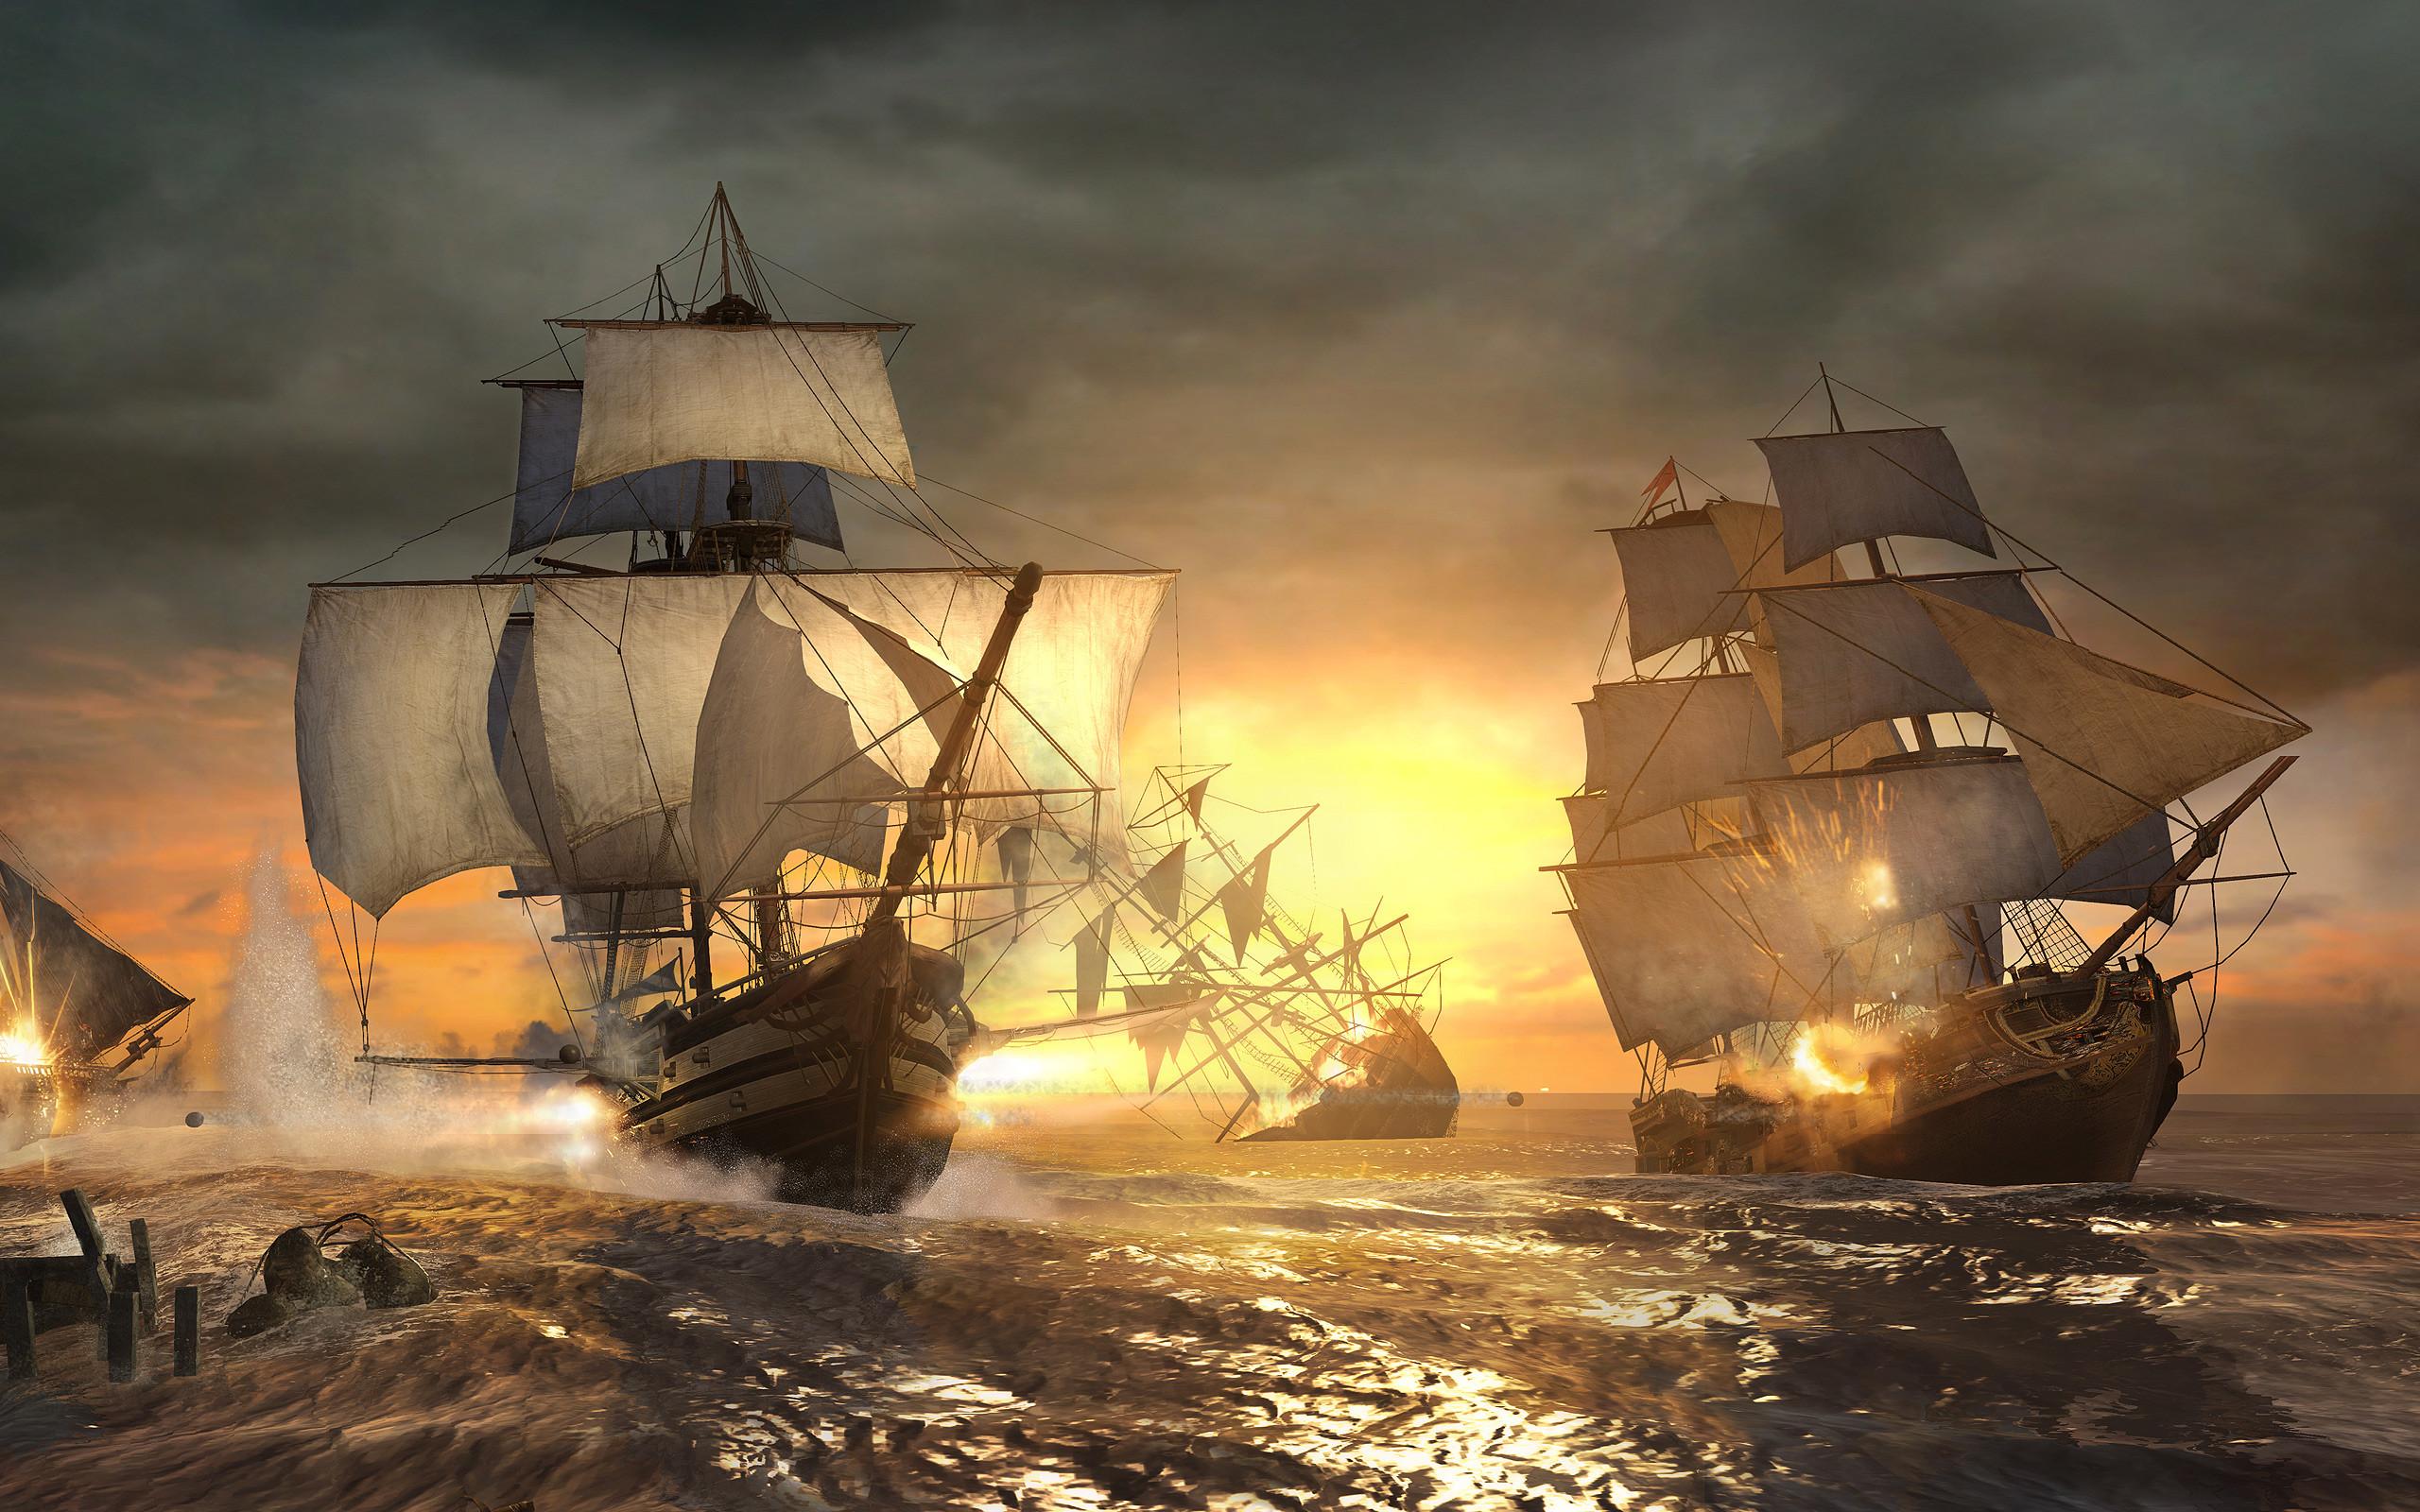 assassins creed 3 naval. Â«Â«